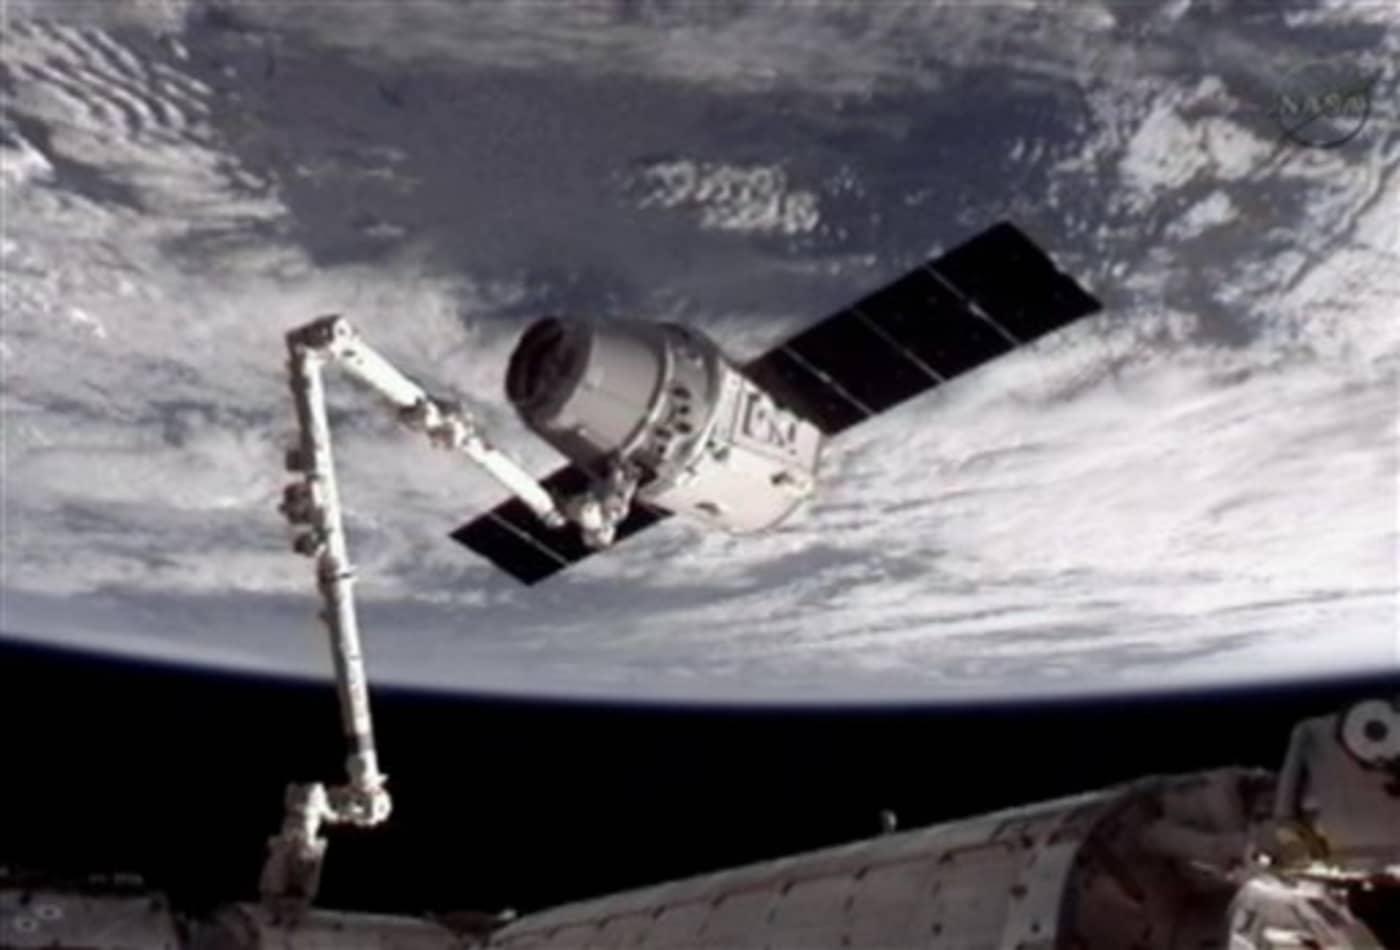 private space race--249023790_v2.jpg